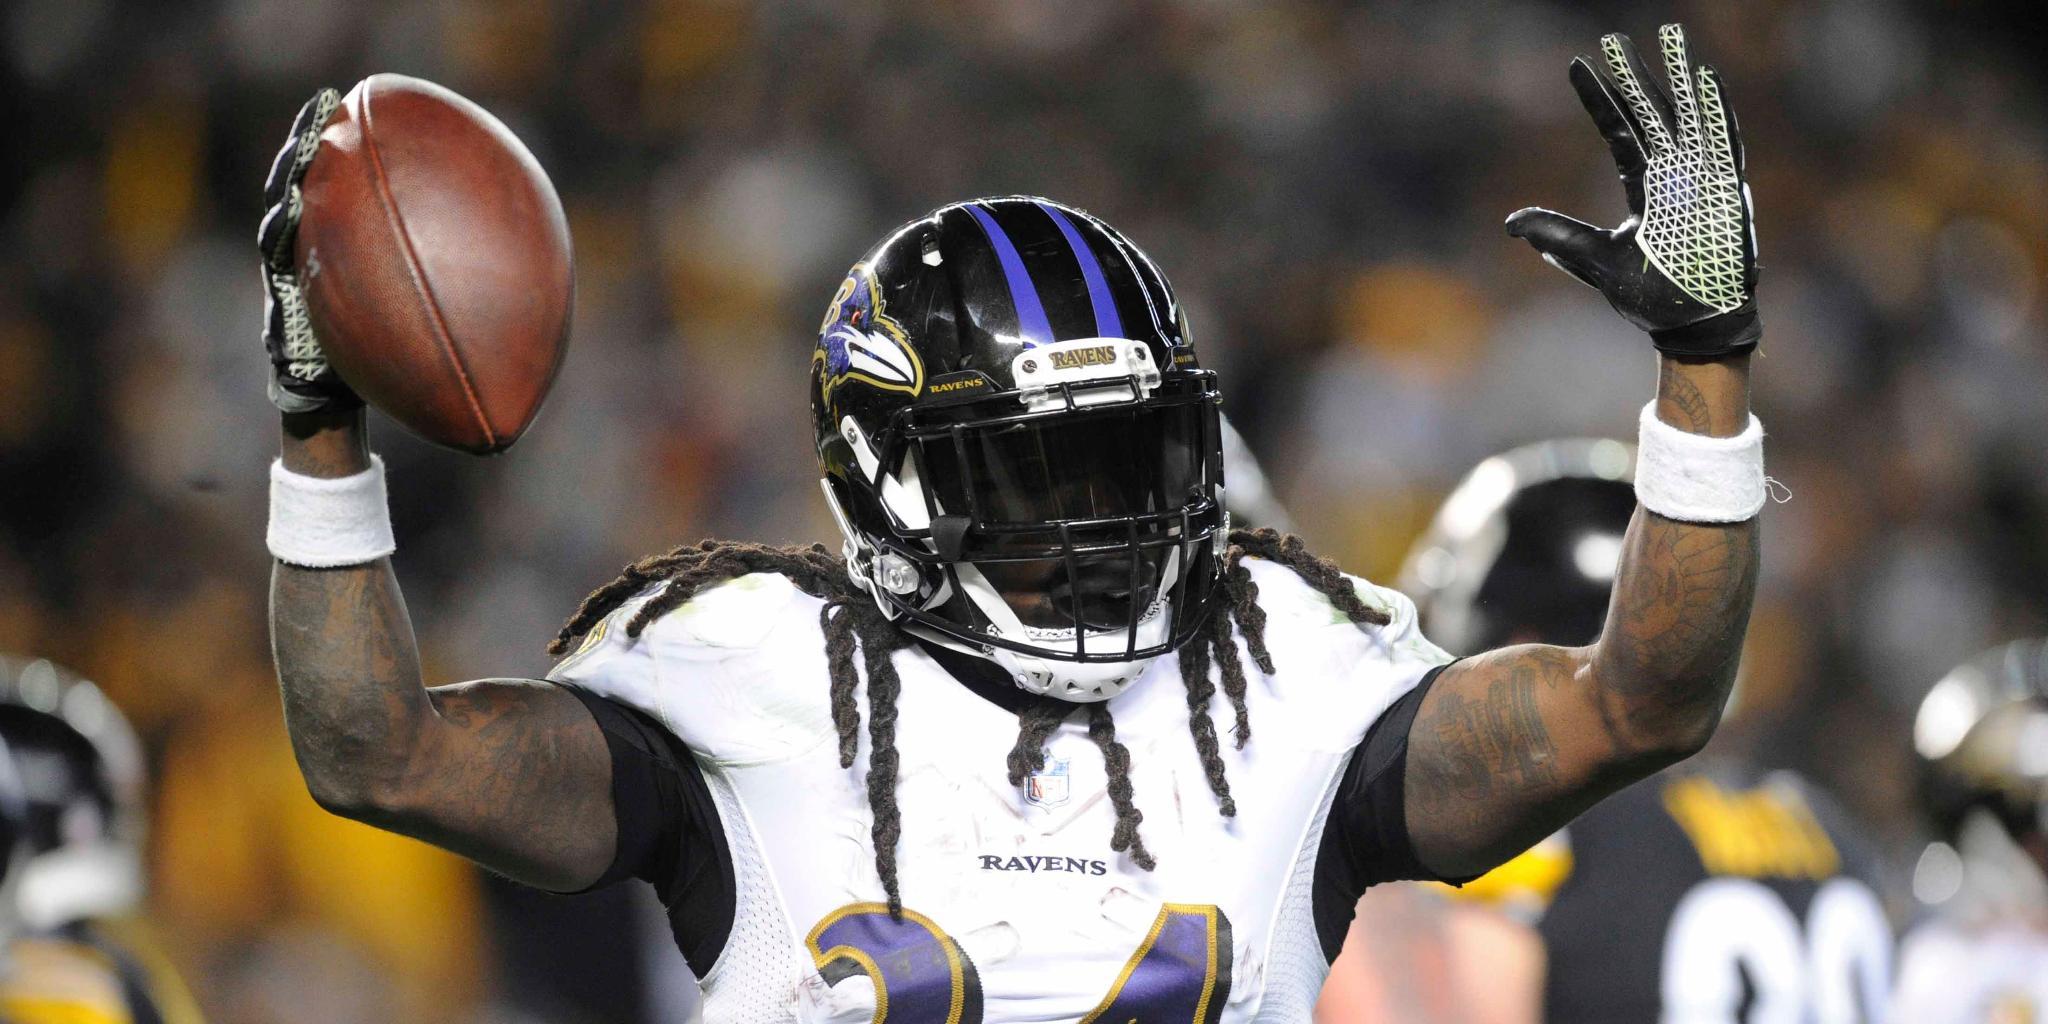 The @Ravens' No. 1 RB?  He'll prove it: https://t.co/aasPBln2vV https://t.co/Pzq0lkiA0G